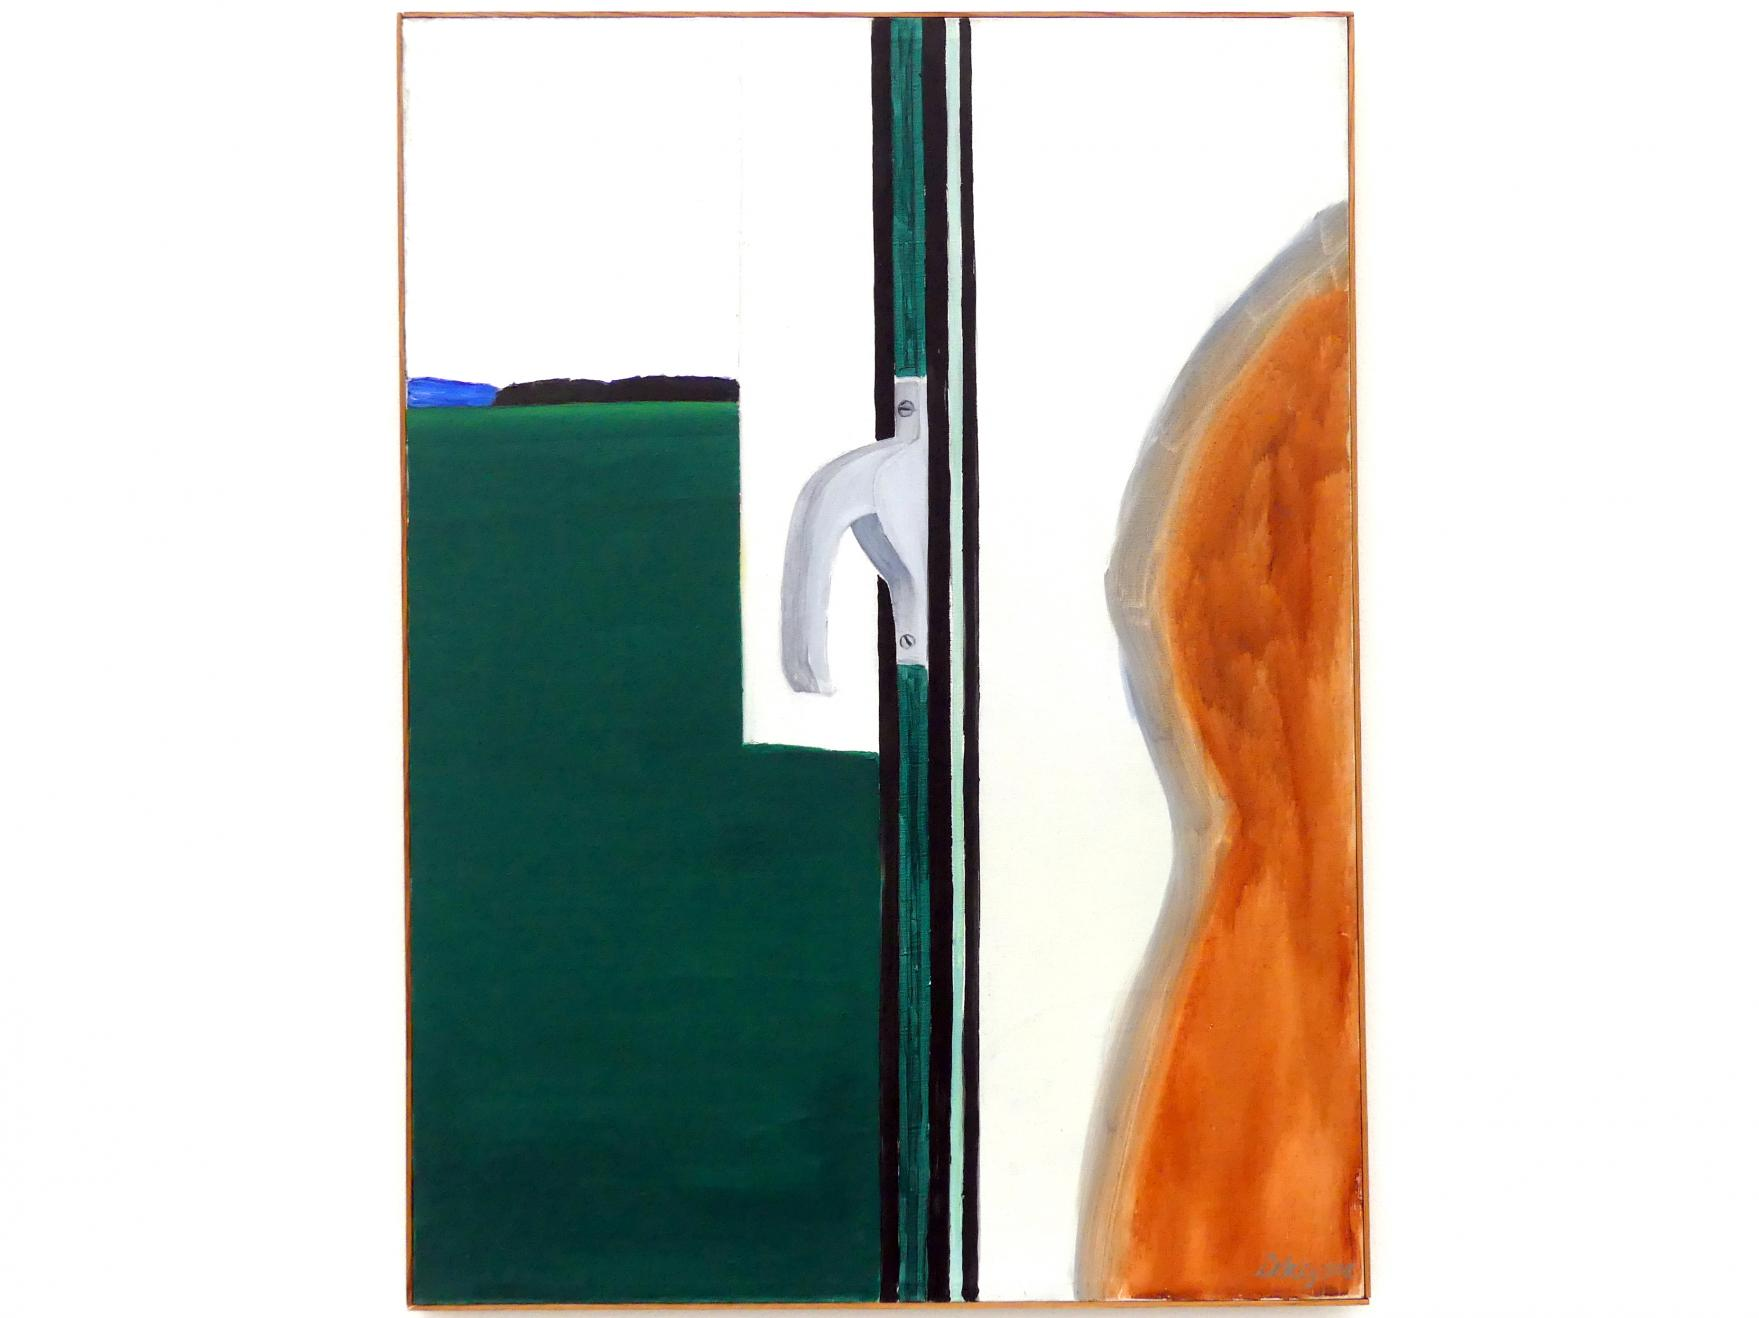 Raoul De Keyser: Raamklink - Fenstergriff, 1964